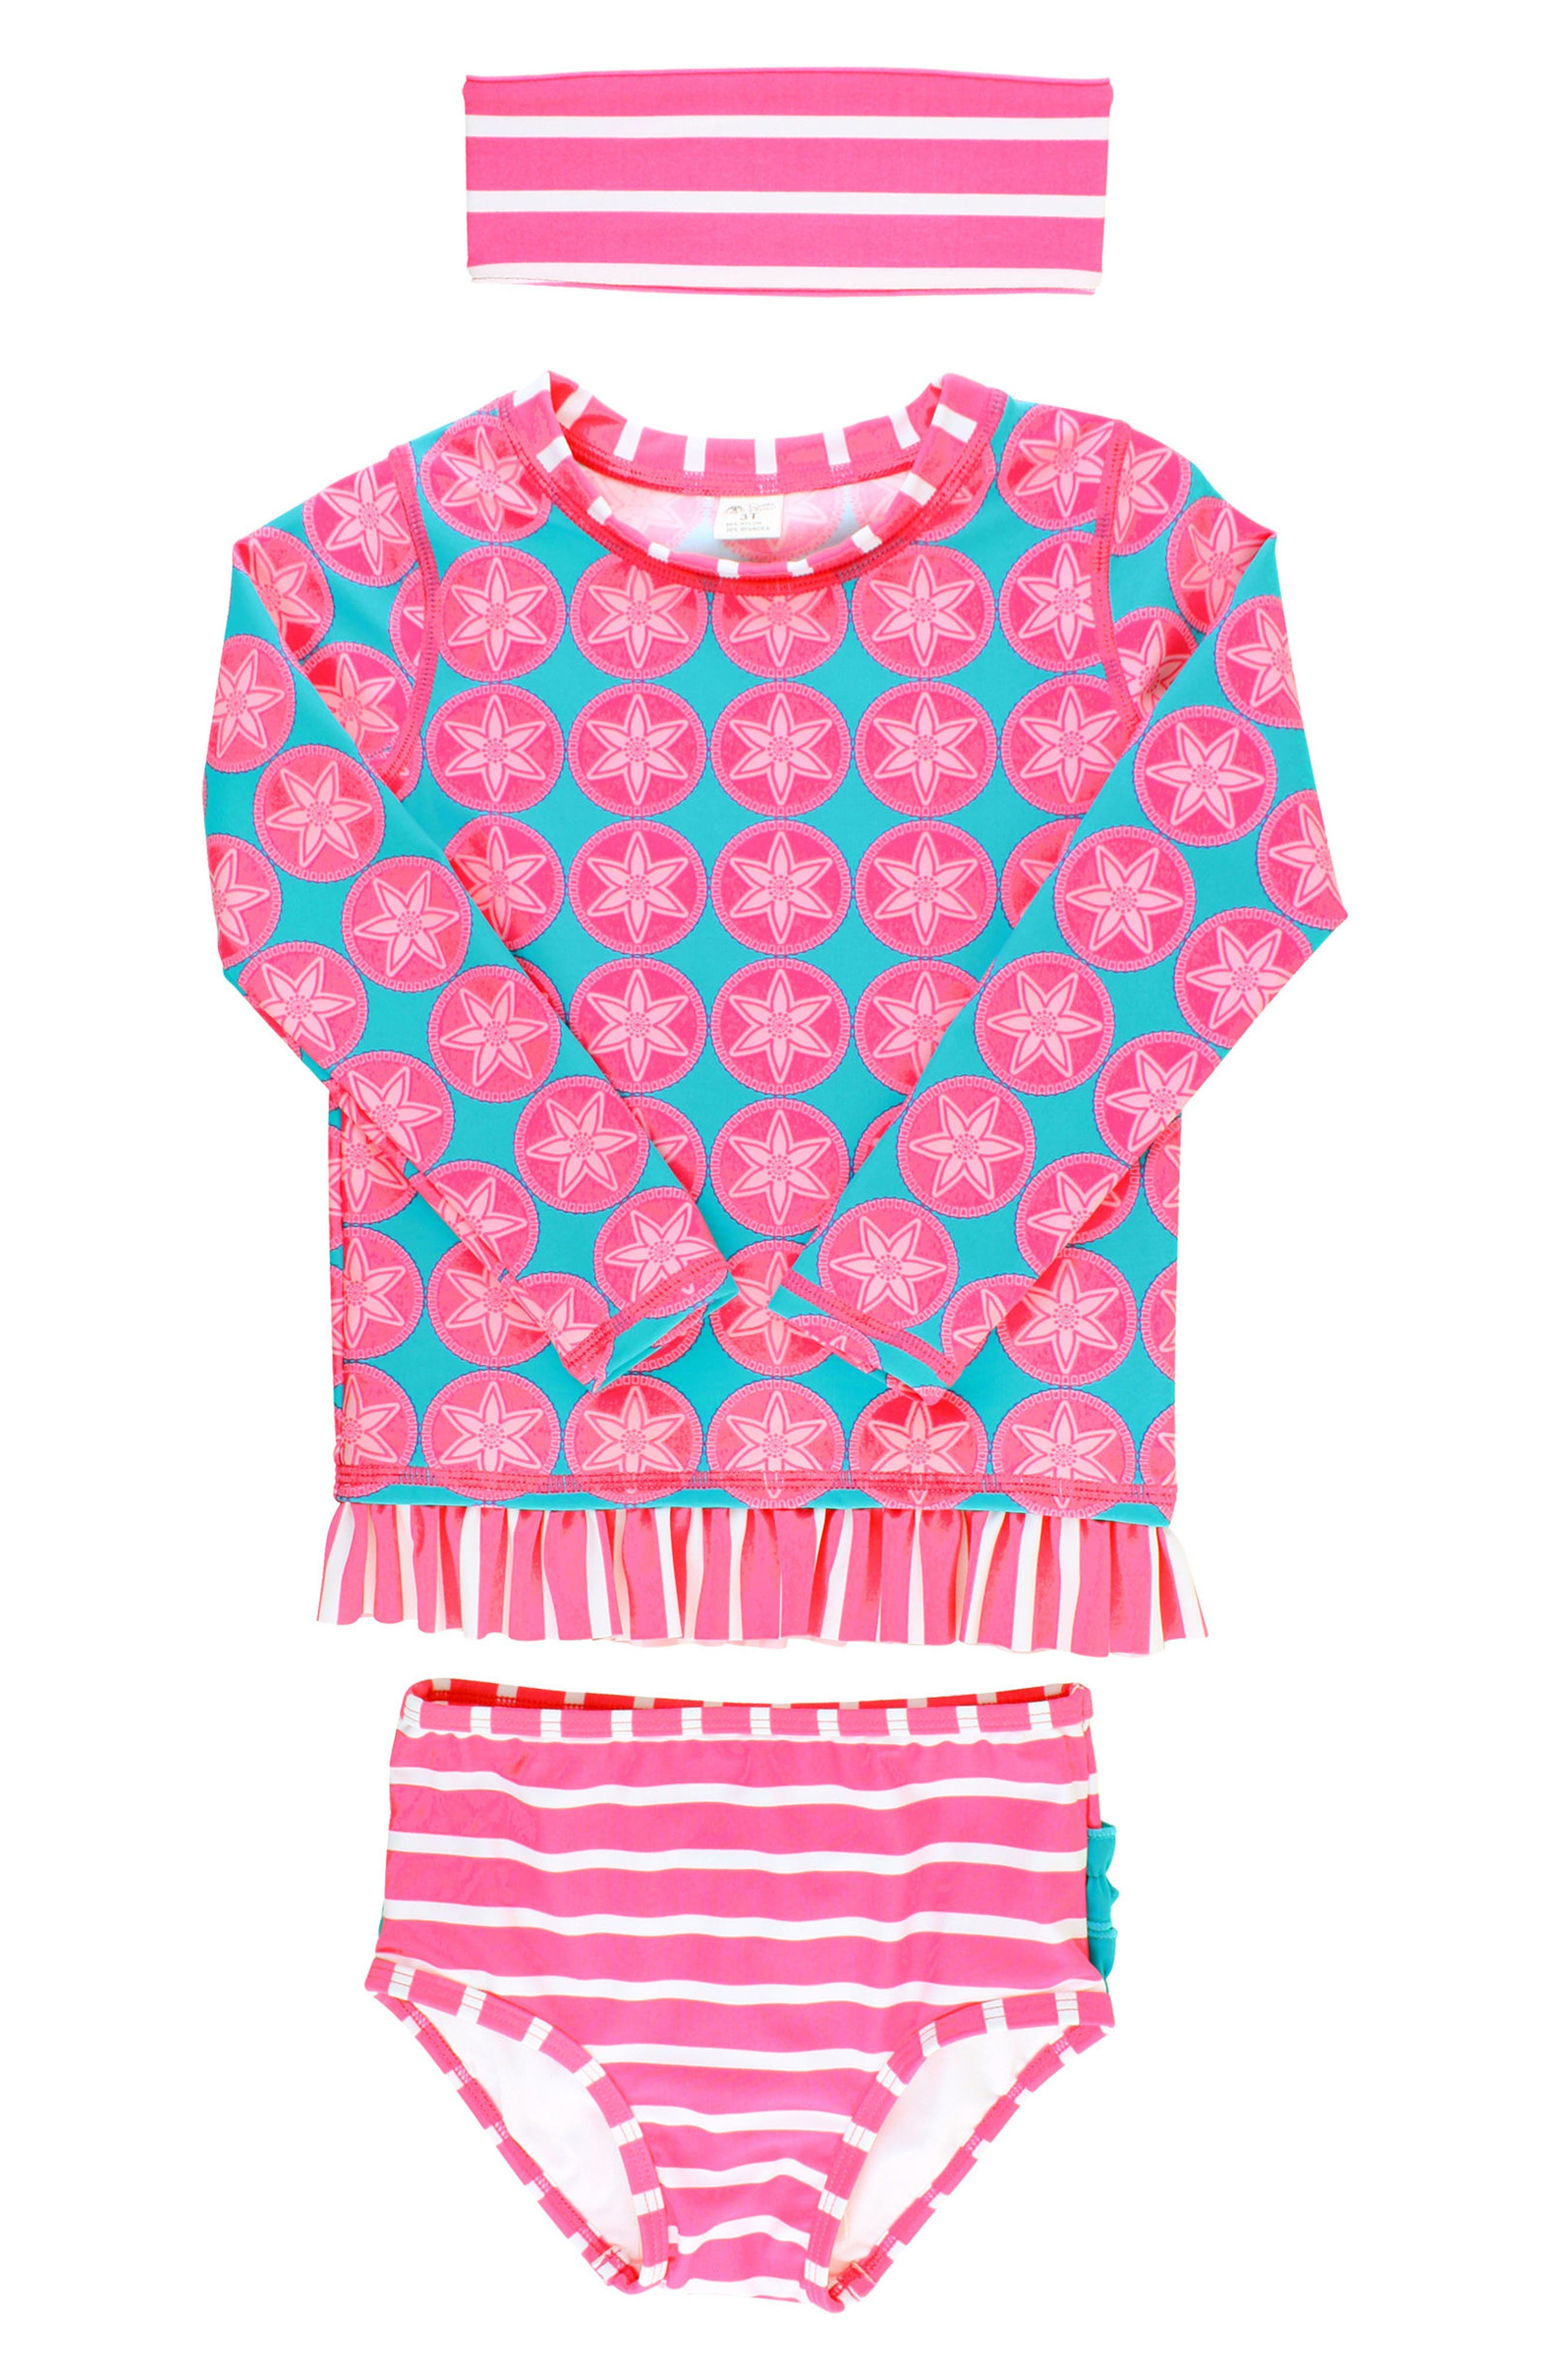 Main Image - RuffleButts Two-Piece Rashguard Swimsuit & Head Wrap Set (Baby Girls)